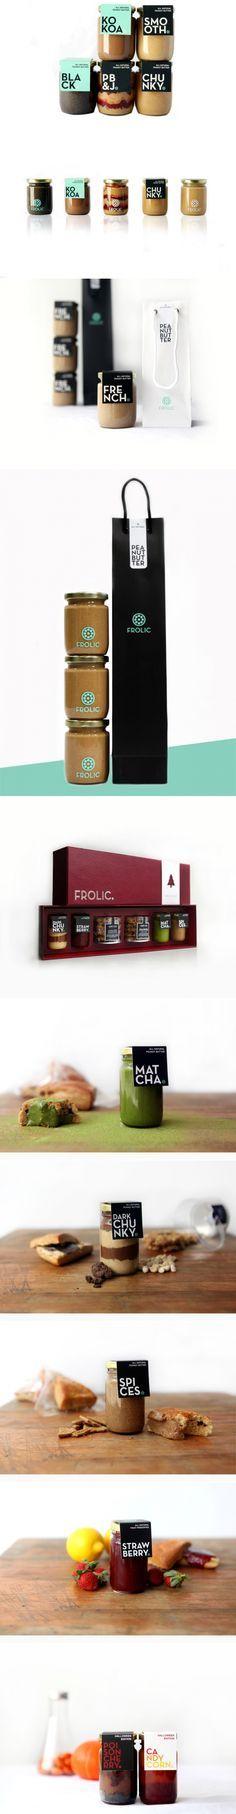 FROLIC — The Dieline | Packaging & Branding Design & Innovation News